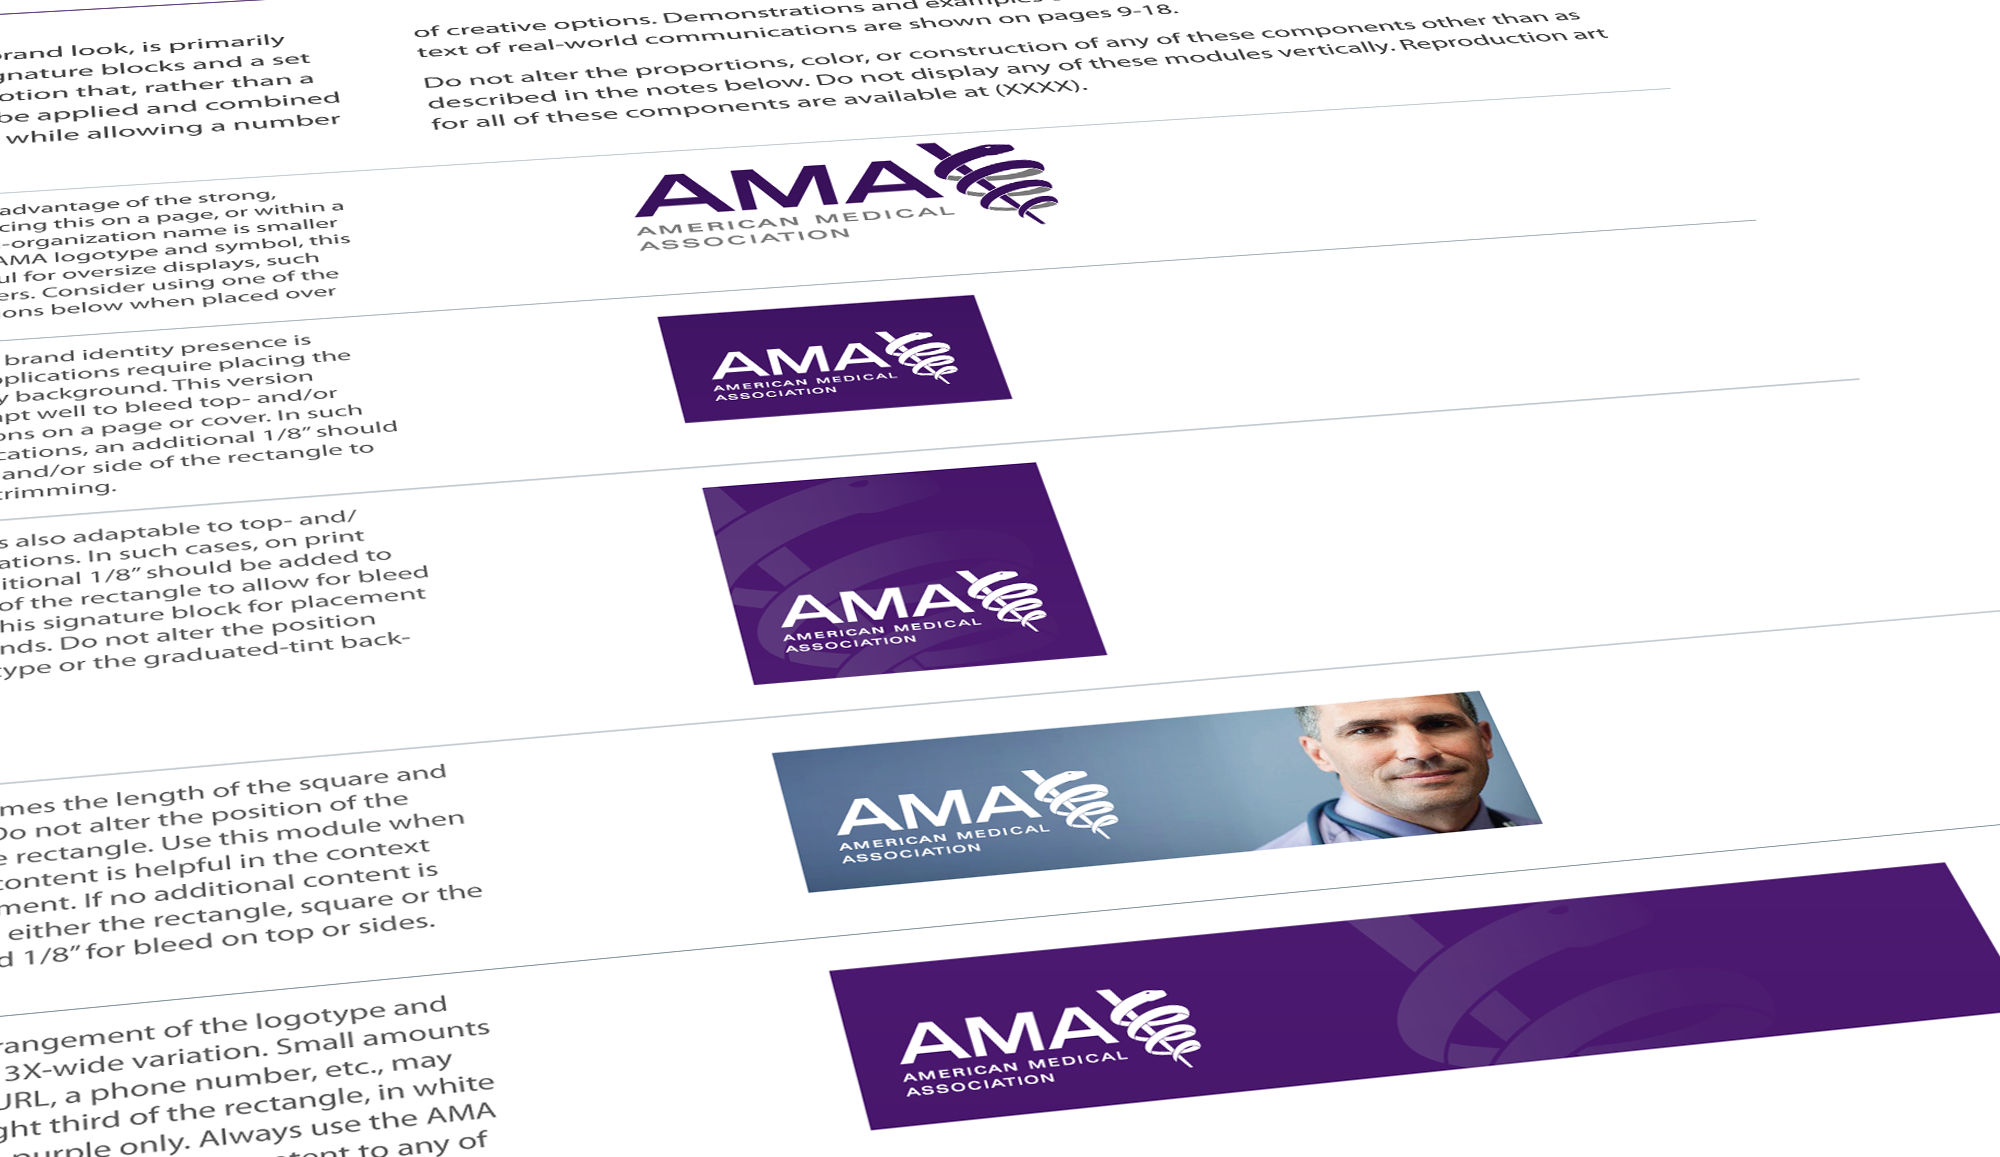 AMA_pageclose4.png